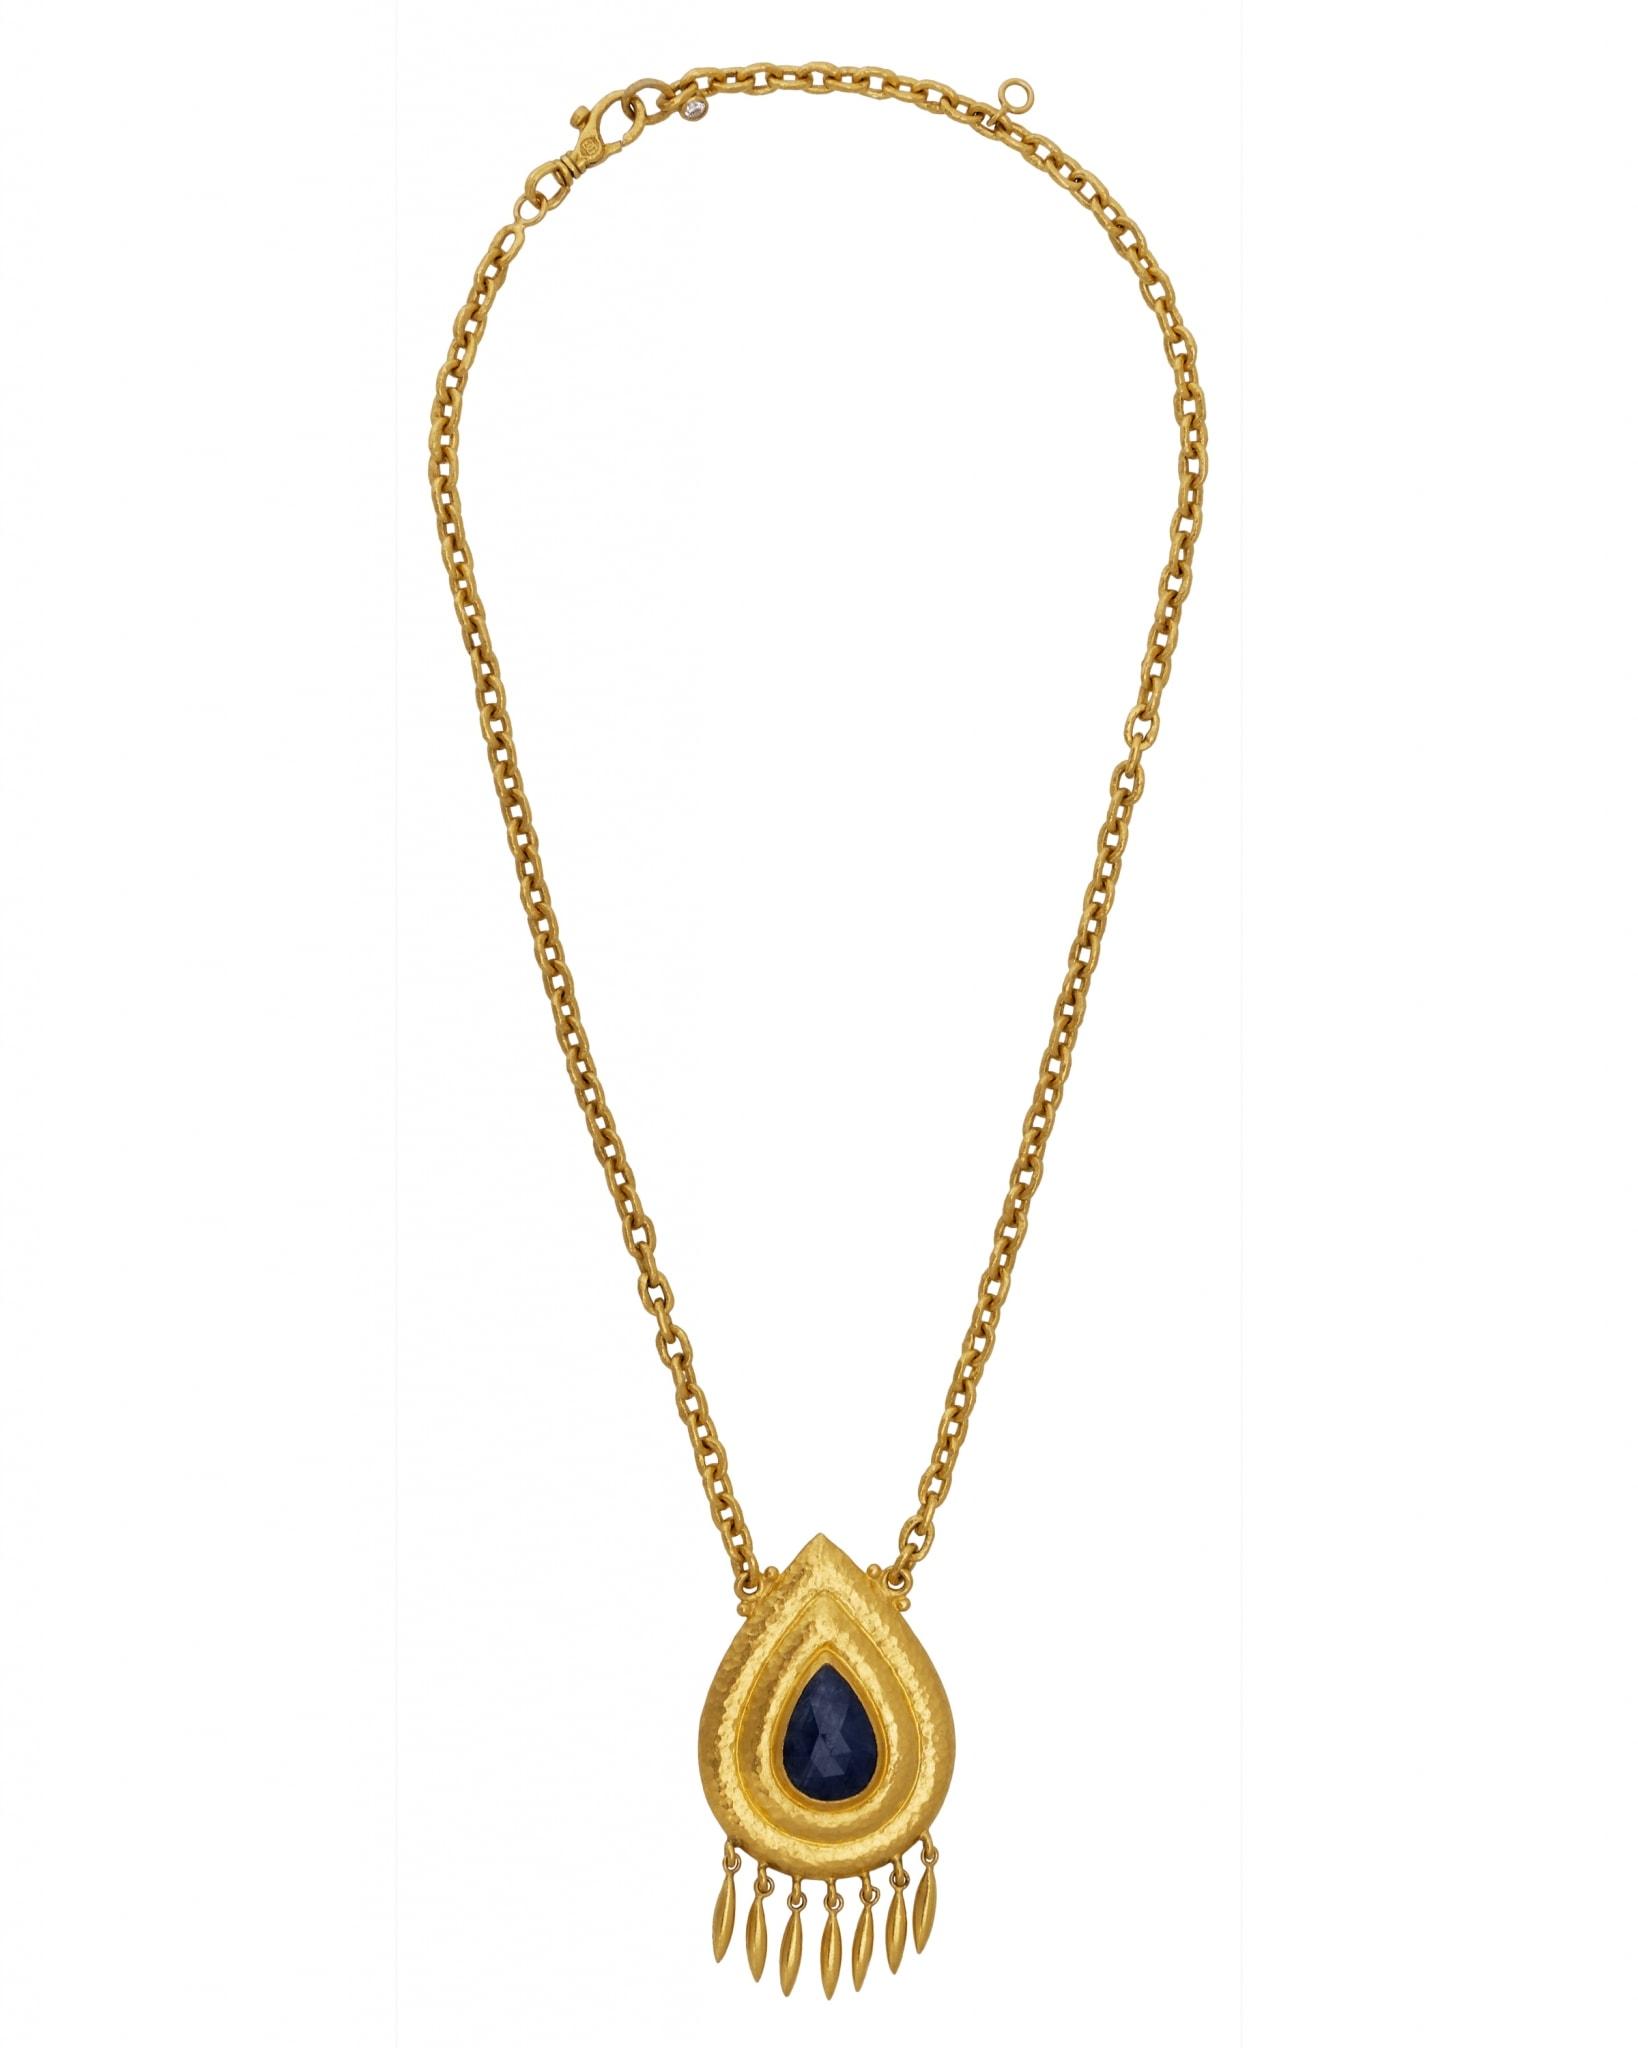 GURHAN 24K Yellow Gold Sapphire Necklace N-U8691-SA